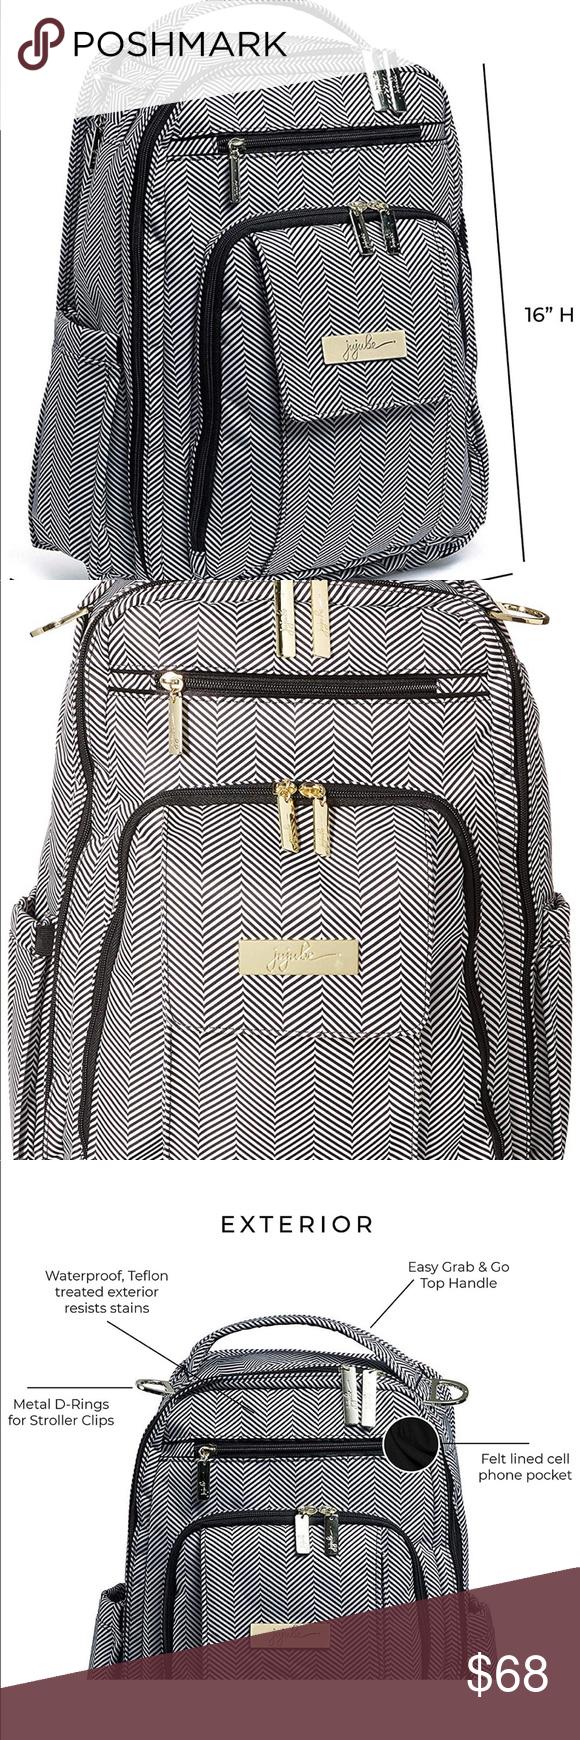 c8be87e22e6d JuJuBe Backpack/Diaper Bag JuJuBe Be Right Back Multi-Functional ...